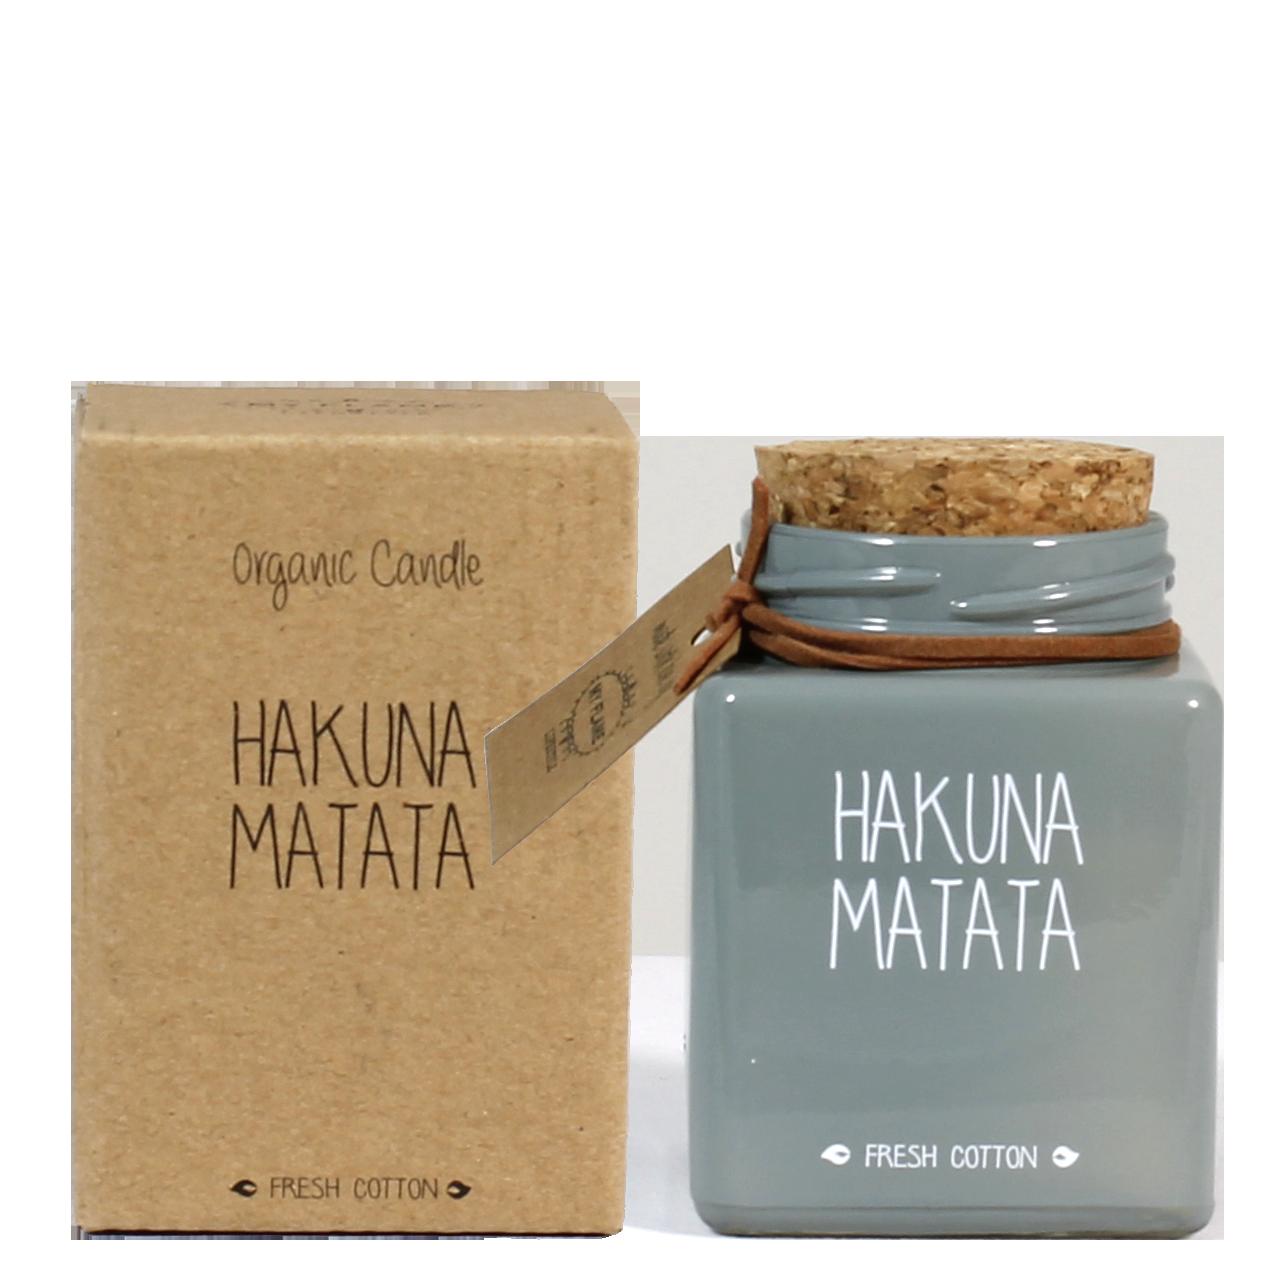 My Flame Lifestyle SOJAKAARS - HAKUNA MATATA - GEUR: MINTY BAMBOO